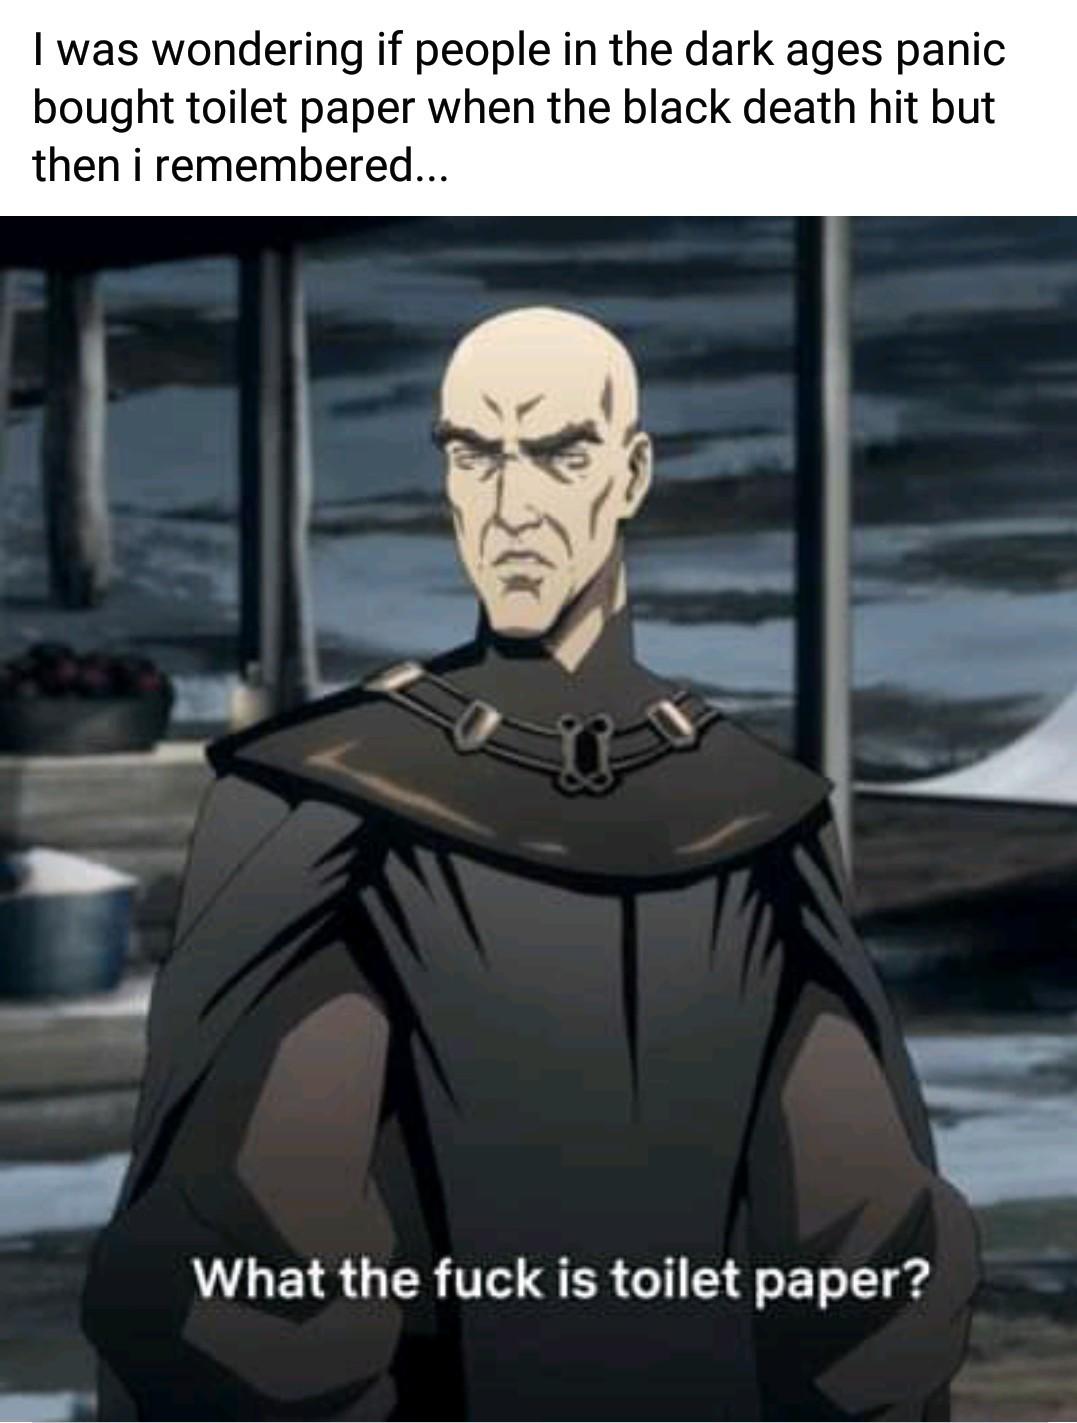 Bet you didn't expect a castlevania corona crossover - meme